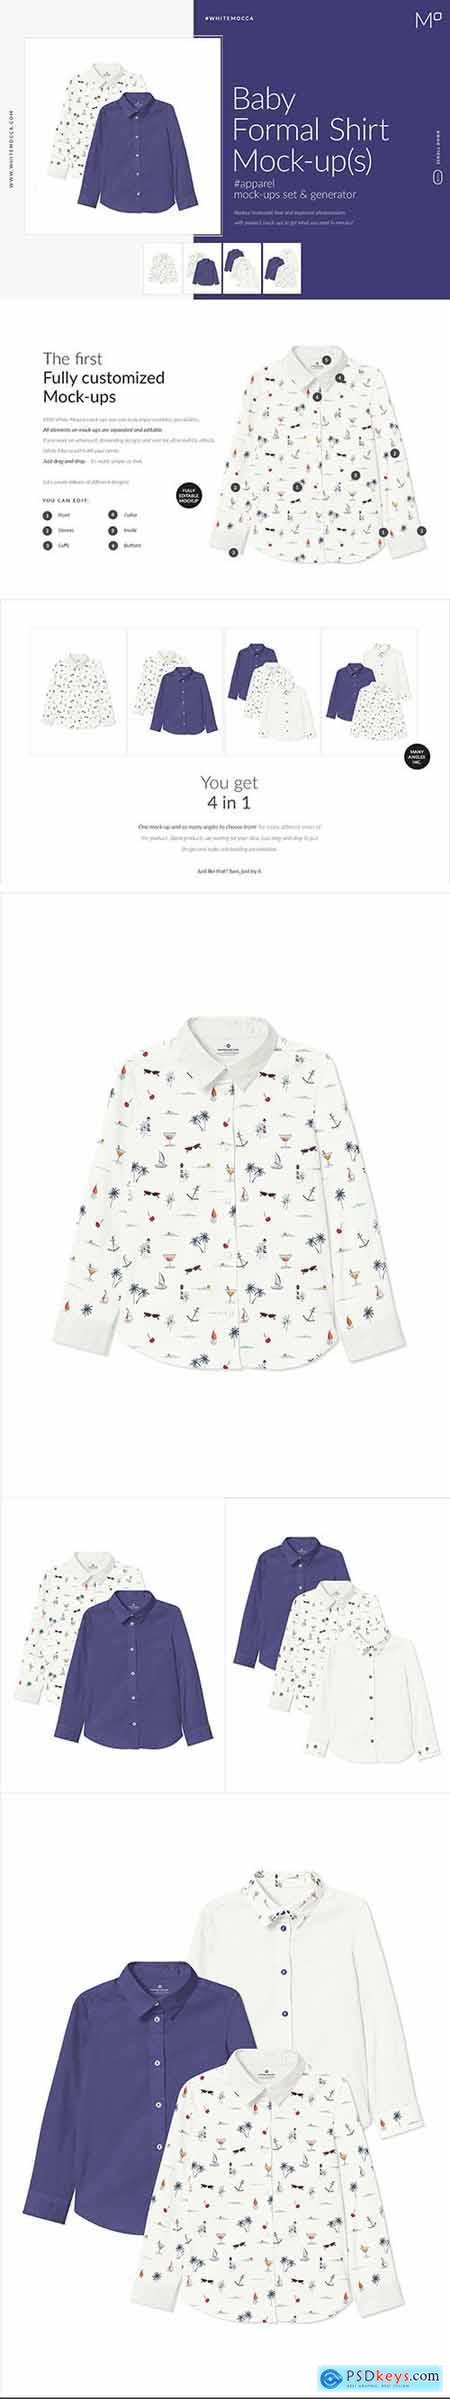 Baby Formal Shirt Mock-ups Set 4543370